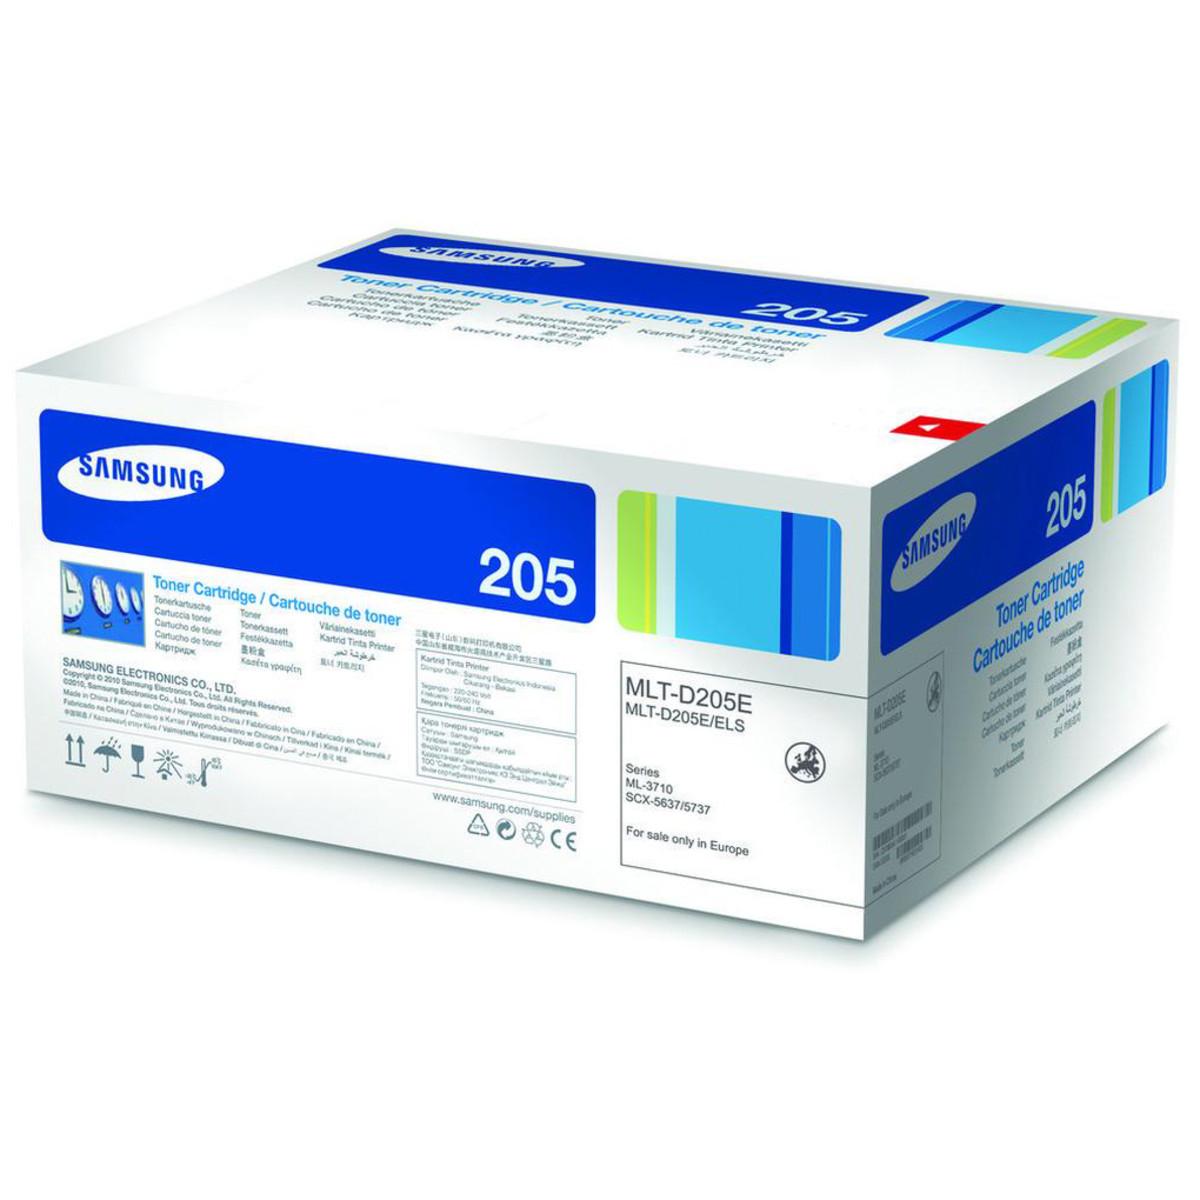 Samsung MLT-D205E Black Toner Cartridge